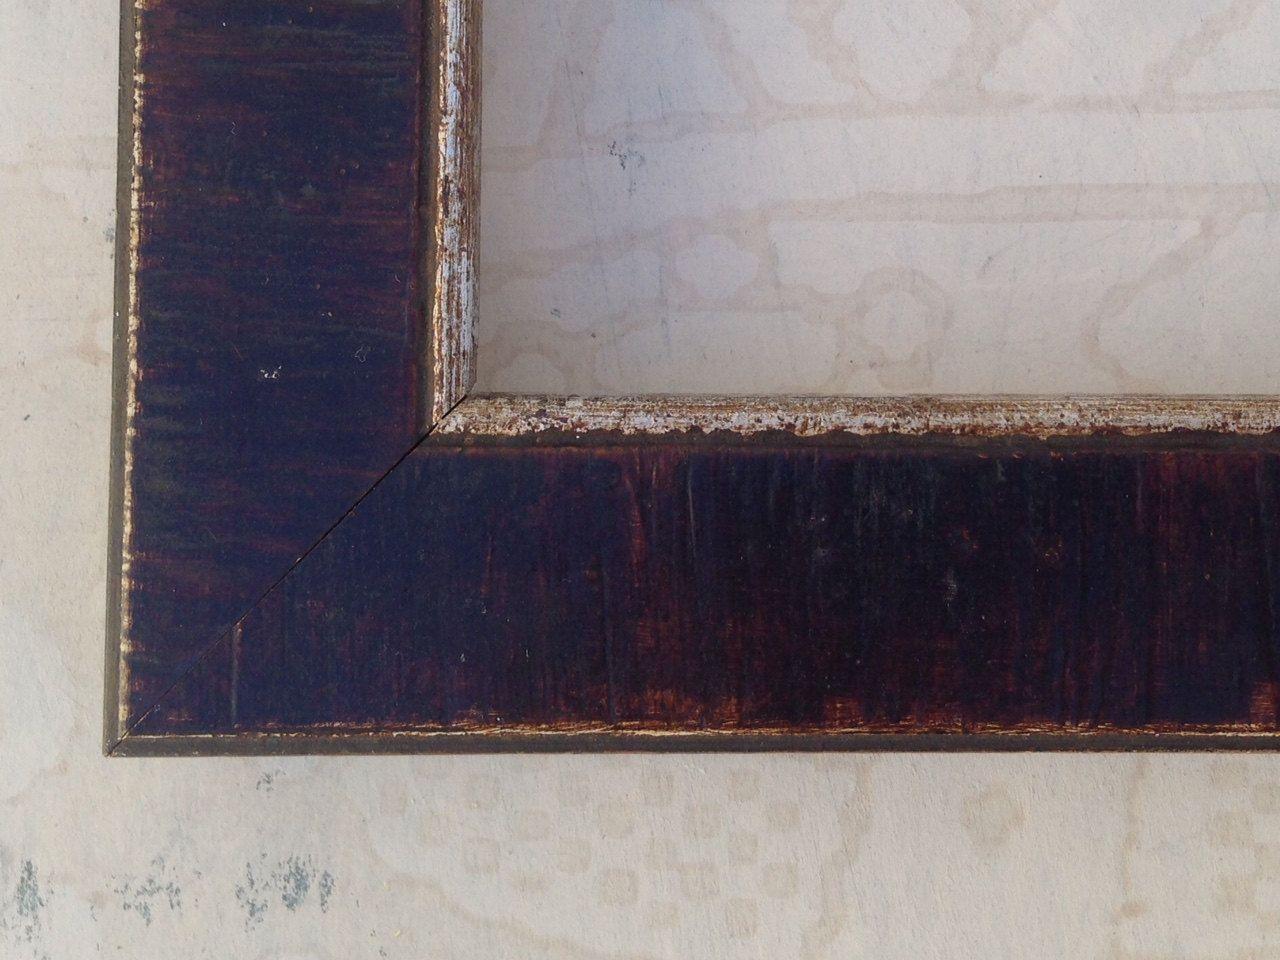 Rustic Wood Picture Frame 4x4, 4x6, 5x5, 5x7, 8x8, 8x10, 8.5x11 ...